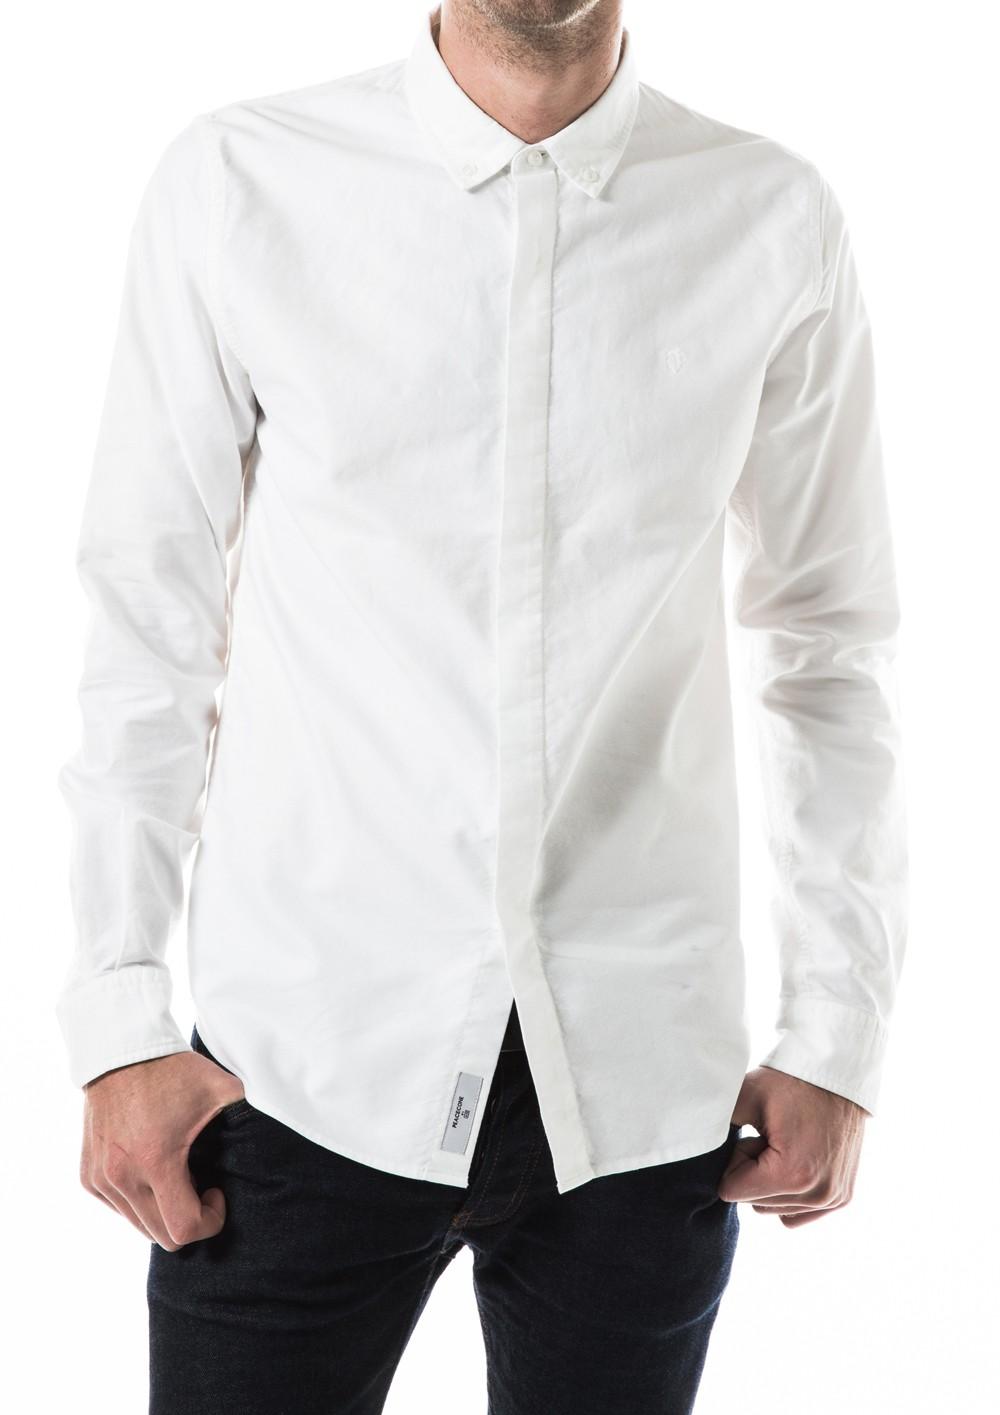 pc_shirt_white_model_front_cropped.jpg